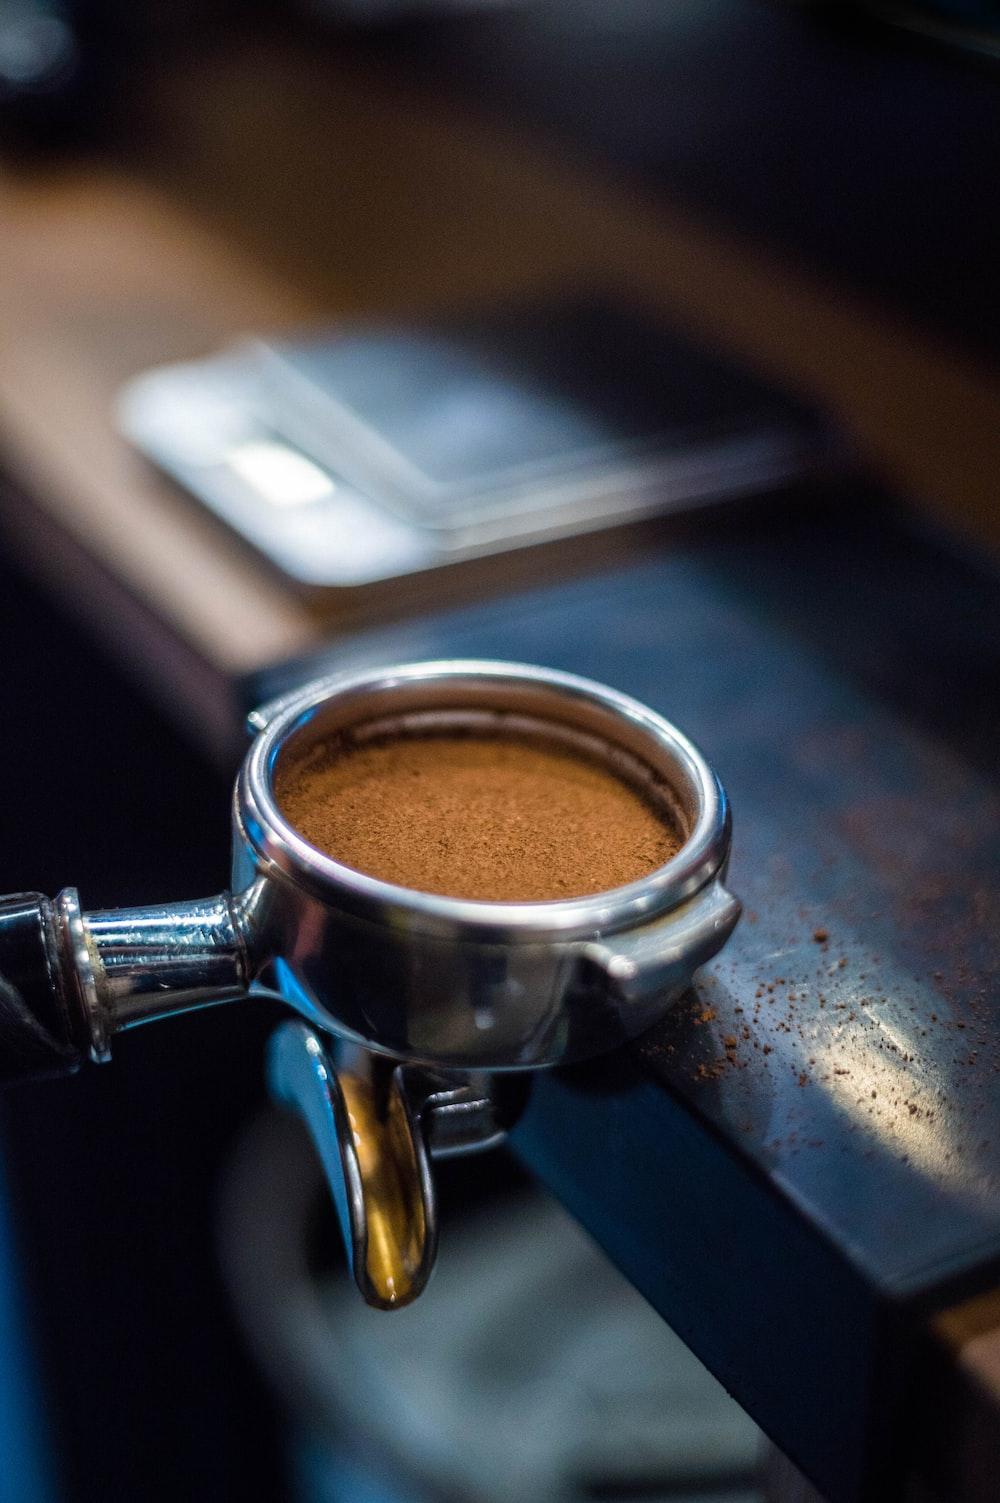 black coffee in silver mug